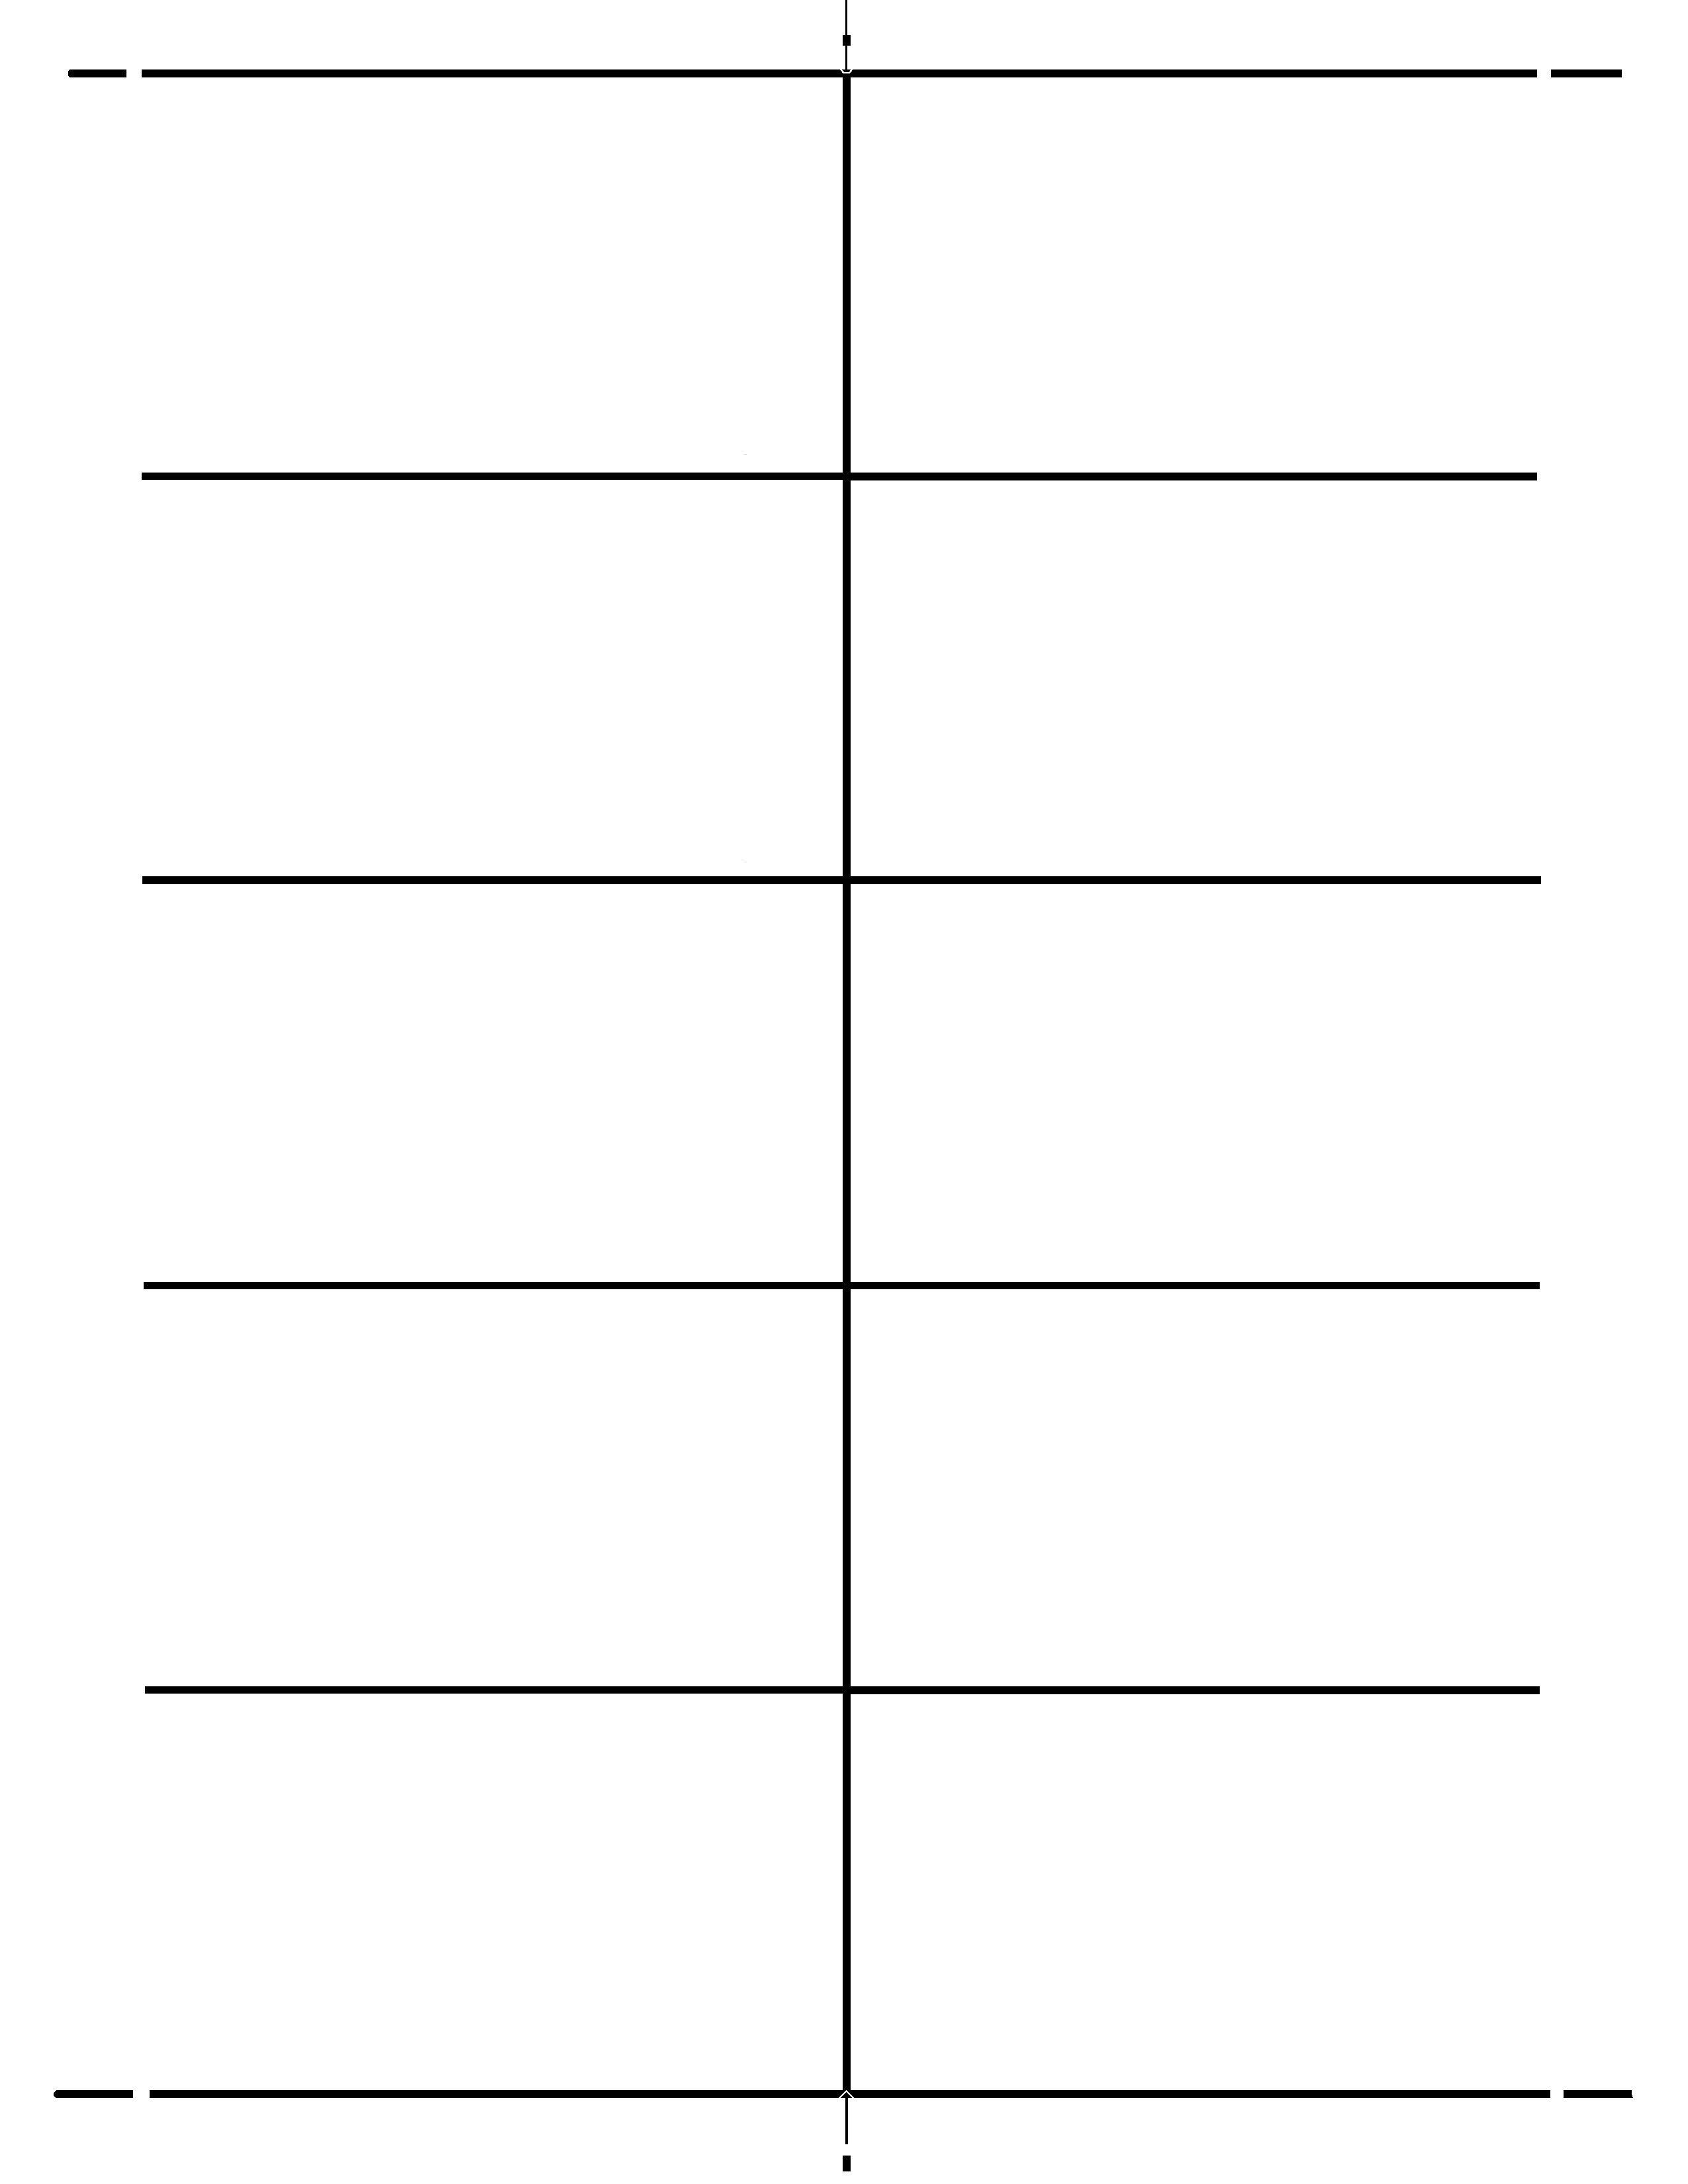 Standard Blank Business Card Template Word Mac Design | Business - Free Printable Blank Business Cards